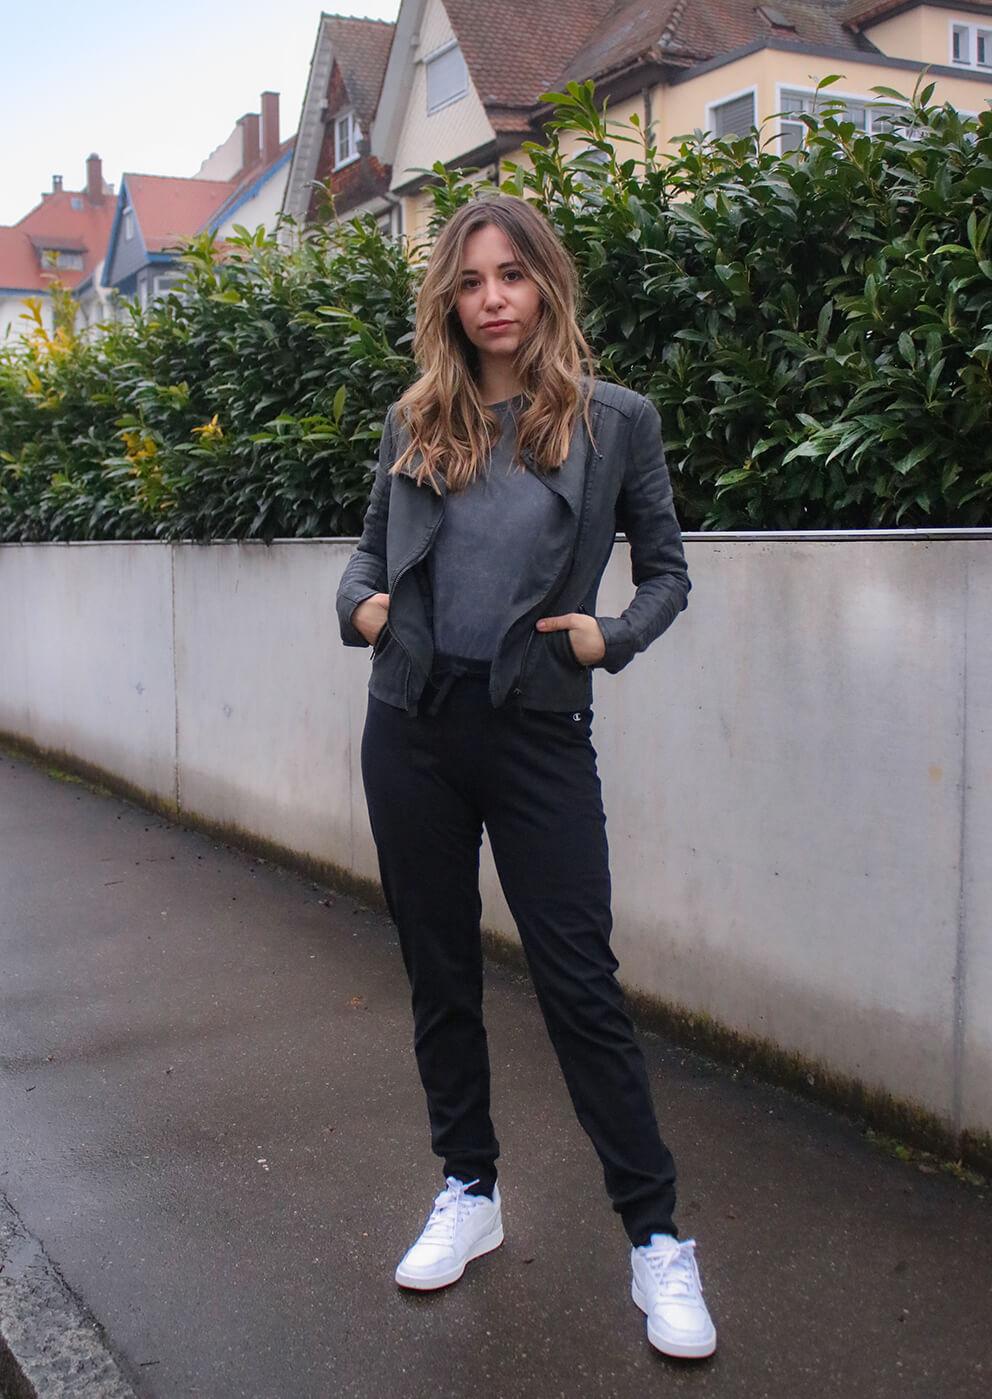 Street Style -Mein Outfit mit Lederjacke und Jogginghose